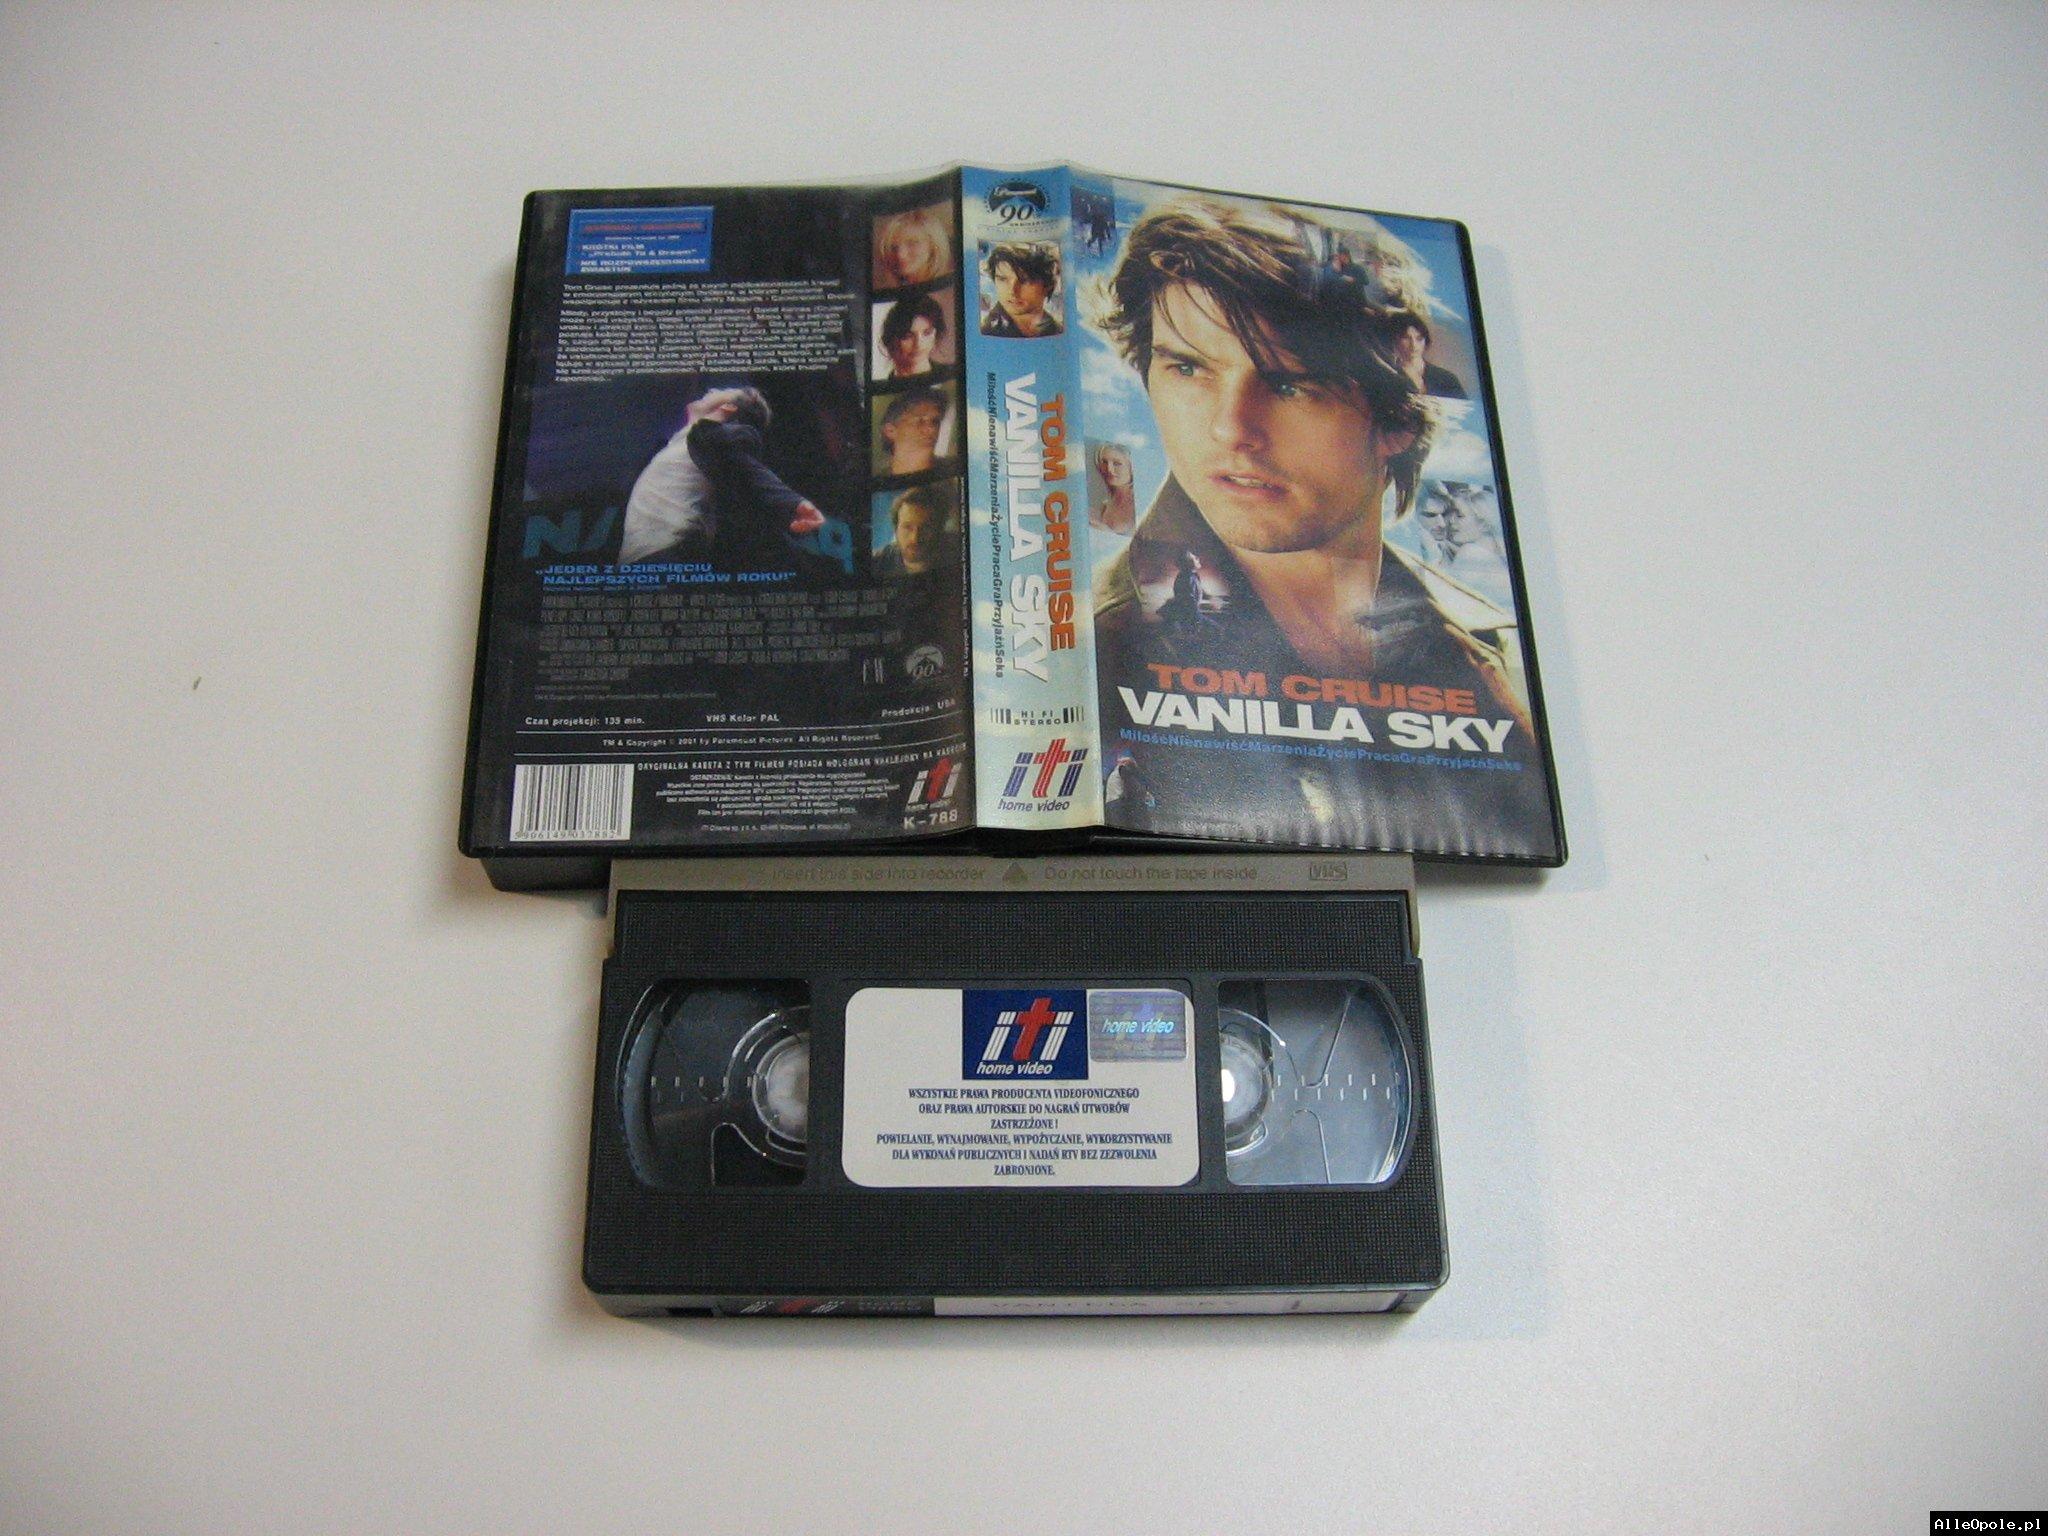 VANILLA SKY - VHS Kaseta Video - Opole 1786